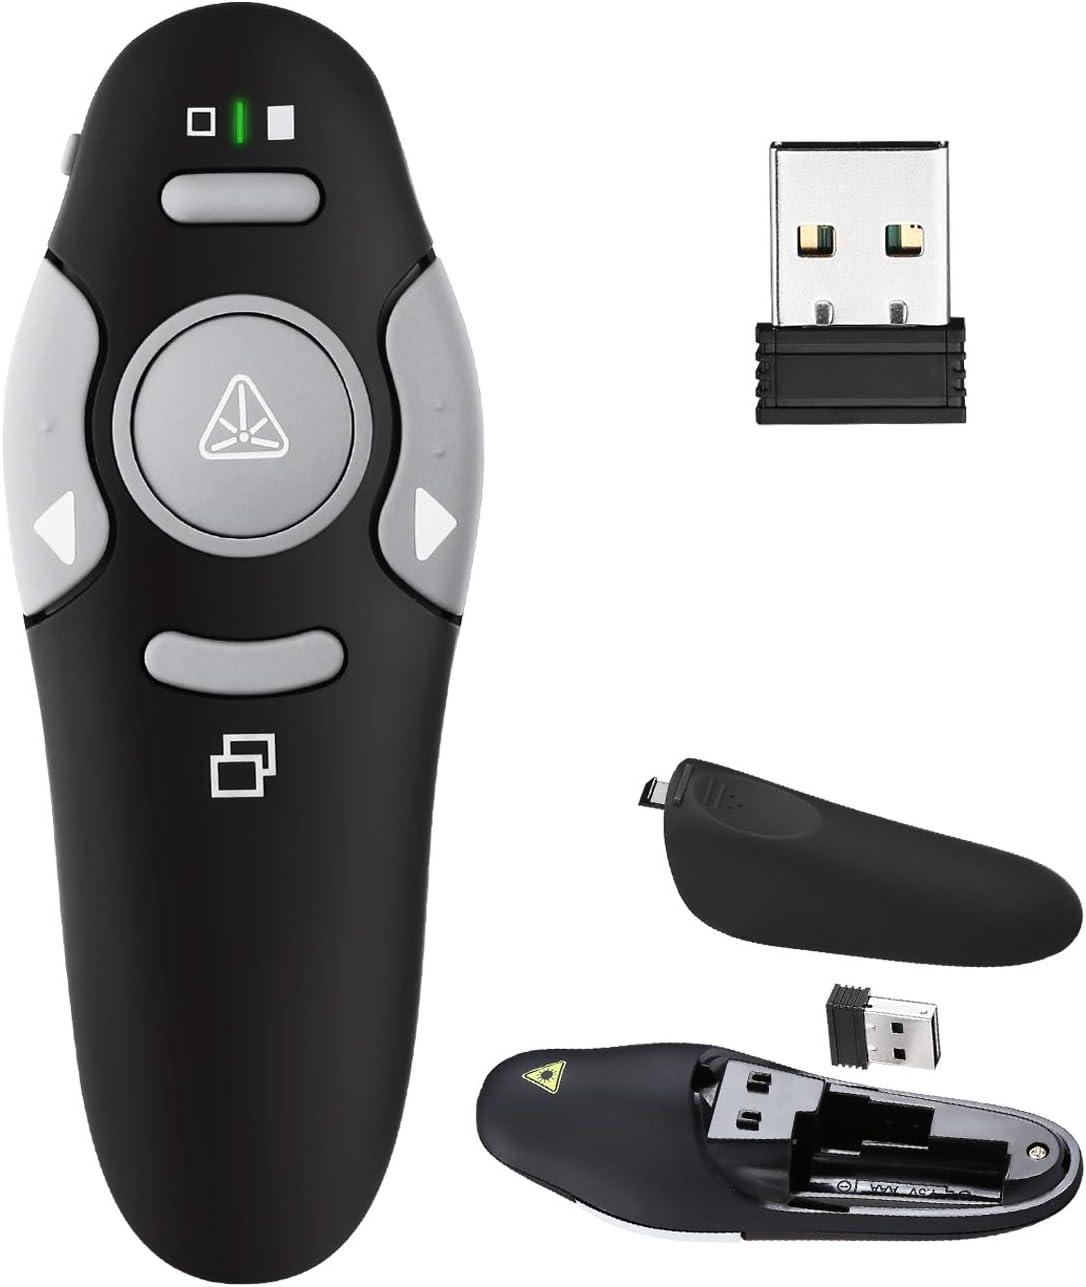 Presentation Clicker Remote Laser Pointer - Wireless USB Presenter - Slideshow PowerPoint Clicker - Compatible with Win10?MAC - Support PPT?Keynote?Google Slides (K100B)